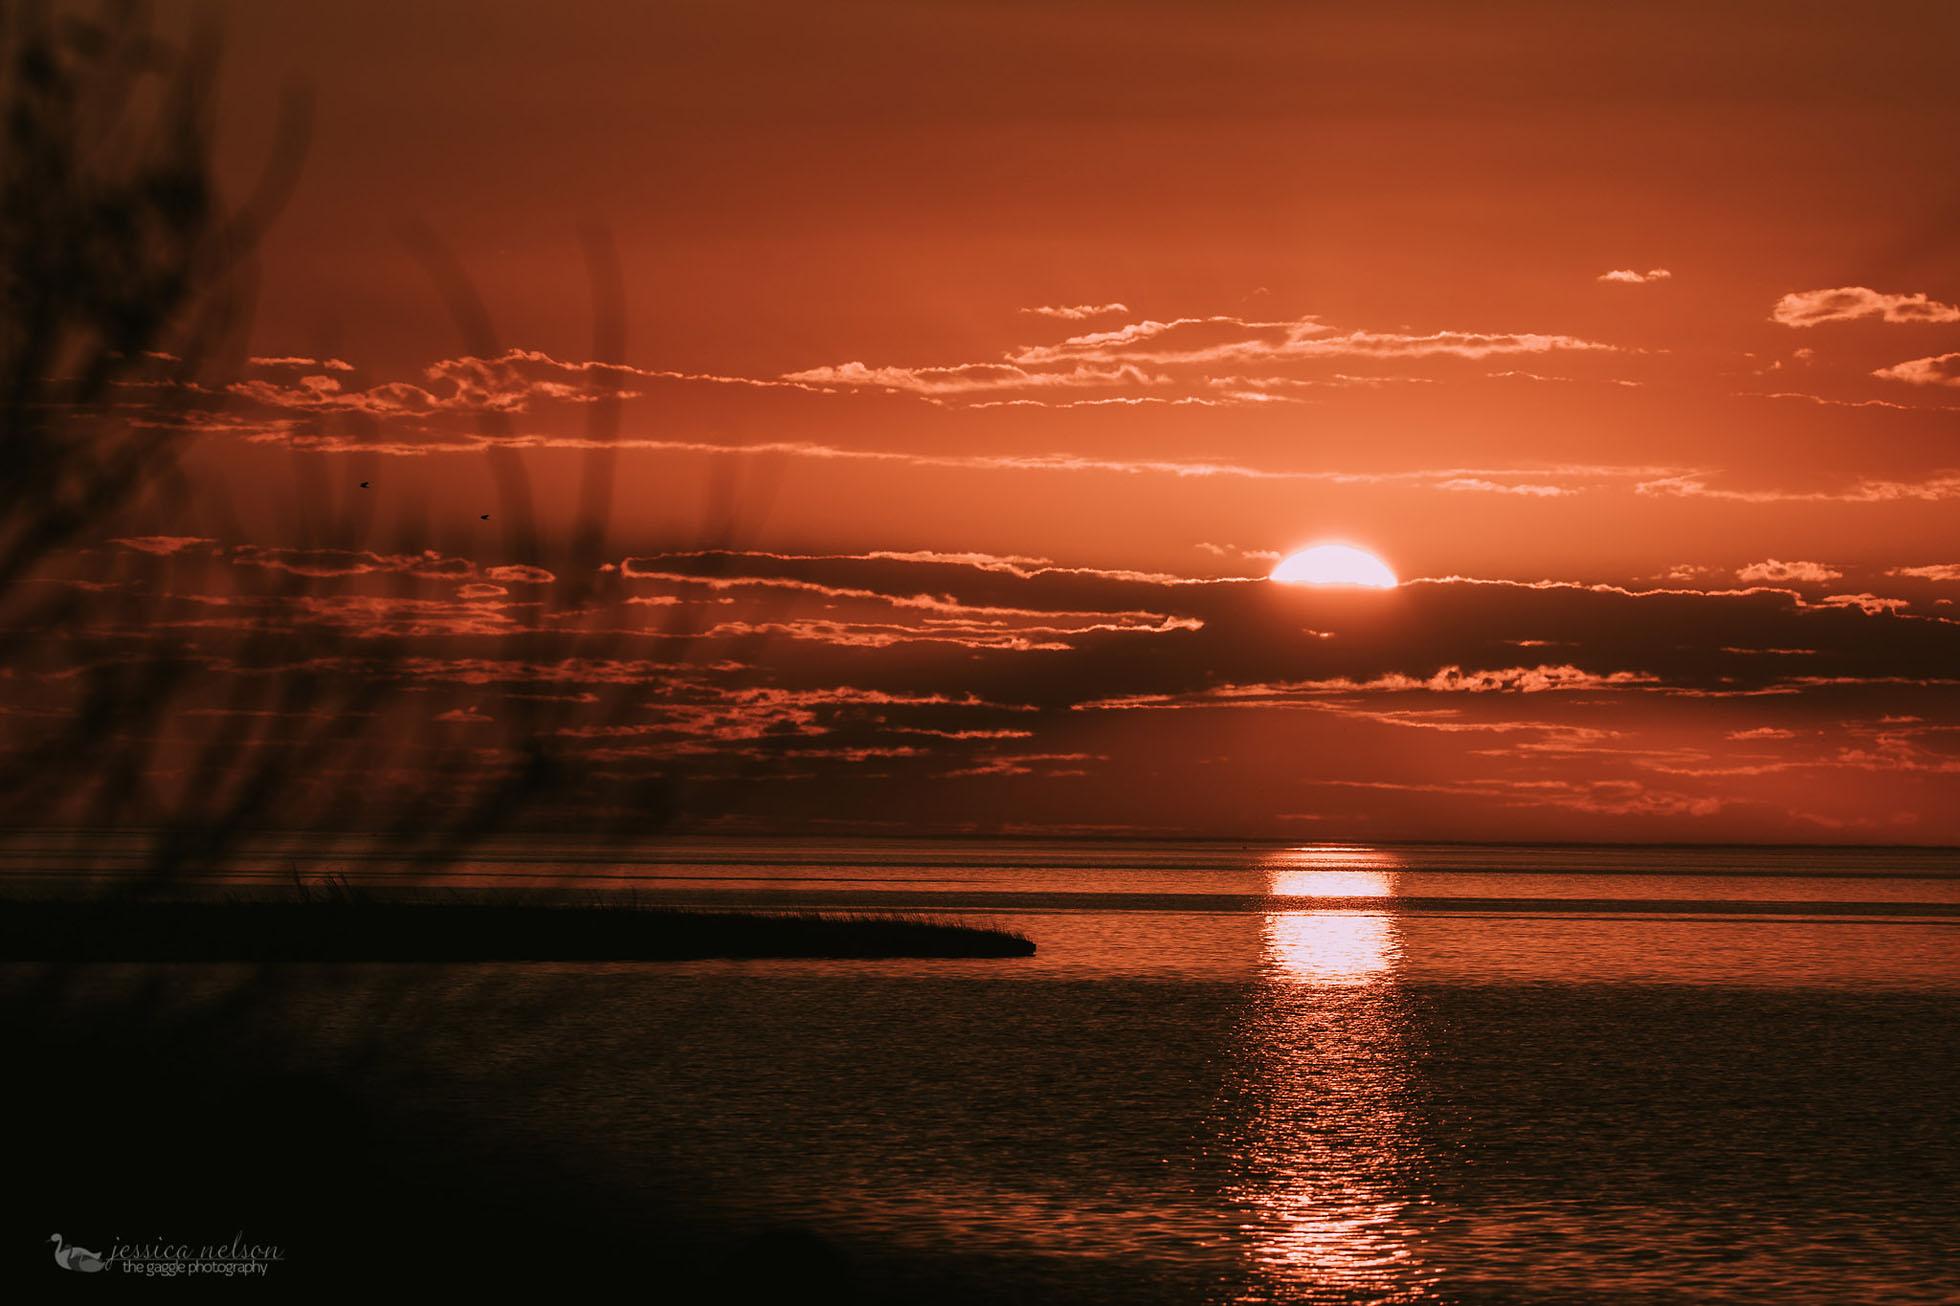 sunset jessica nelson